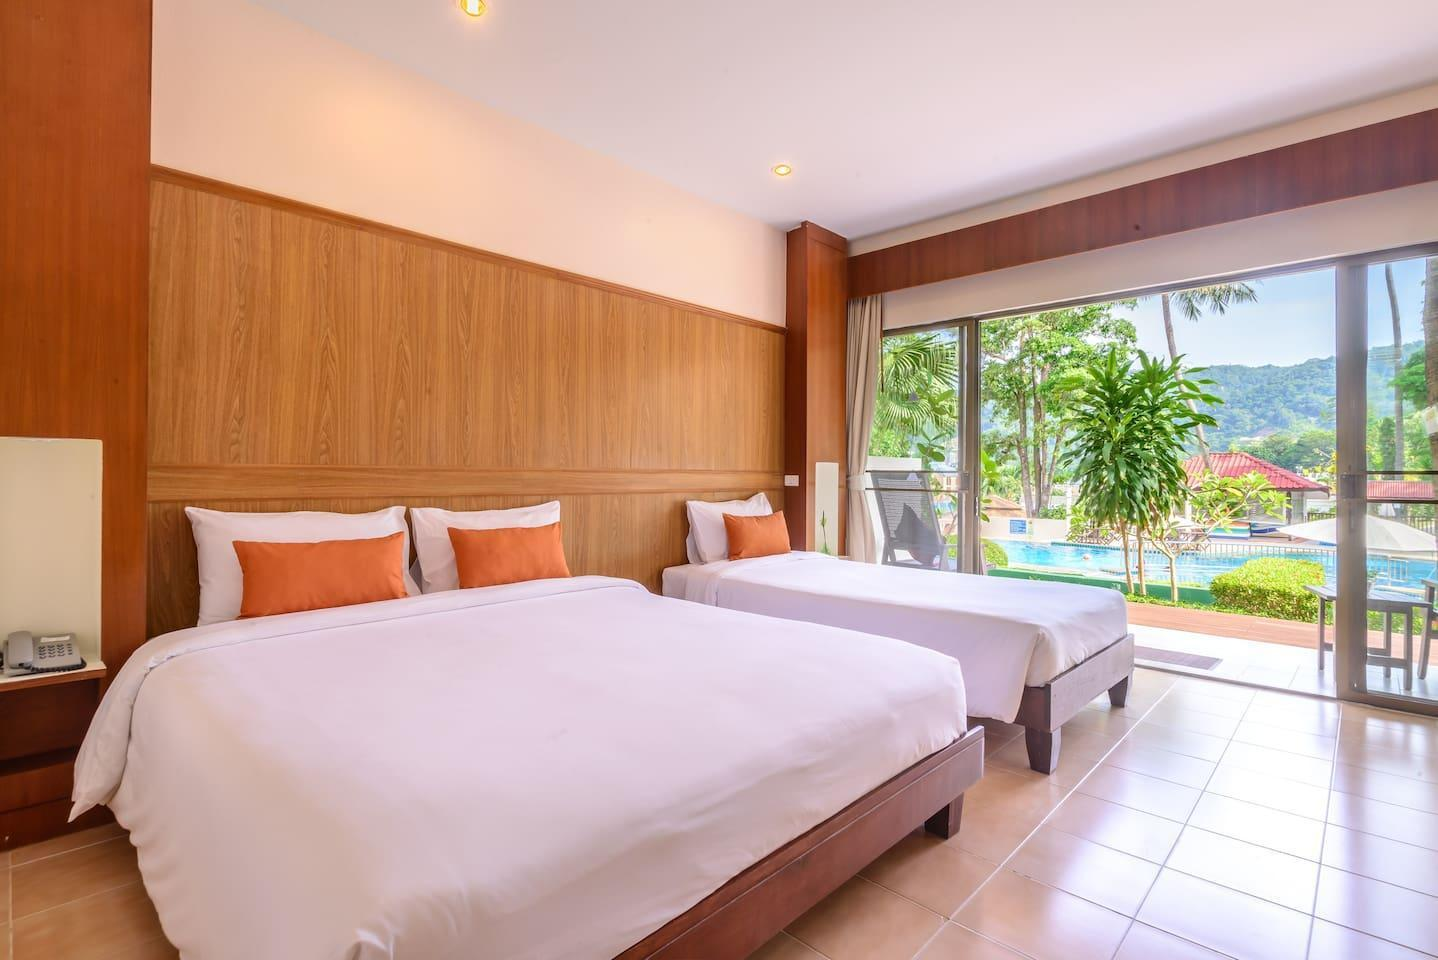 Terrace Triple Pool-View @ Patong Lodge Hotel 1 ห้องนอน 1 ห้องน้ำส่วนตัว ขนาด 40 ตร.ม. – ป่าตอง